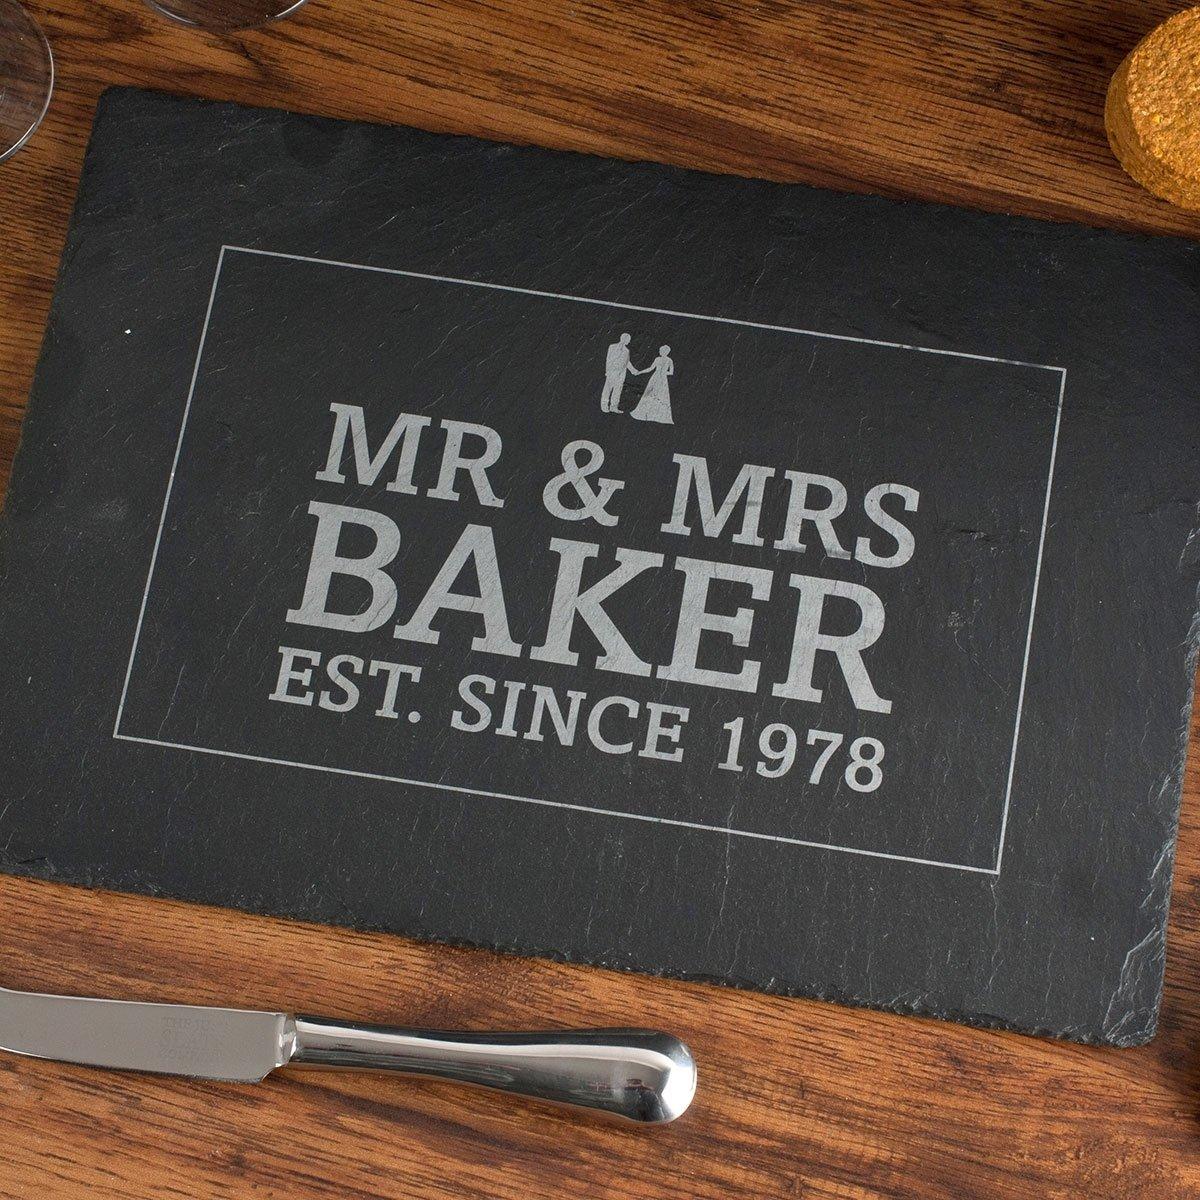 10 Perfect 10 Year Anniversary Gift Ideas For Husband personalised slate cheeseboard anniversary gettingpersonal co uk 3 2020